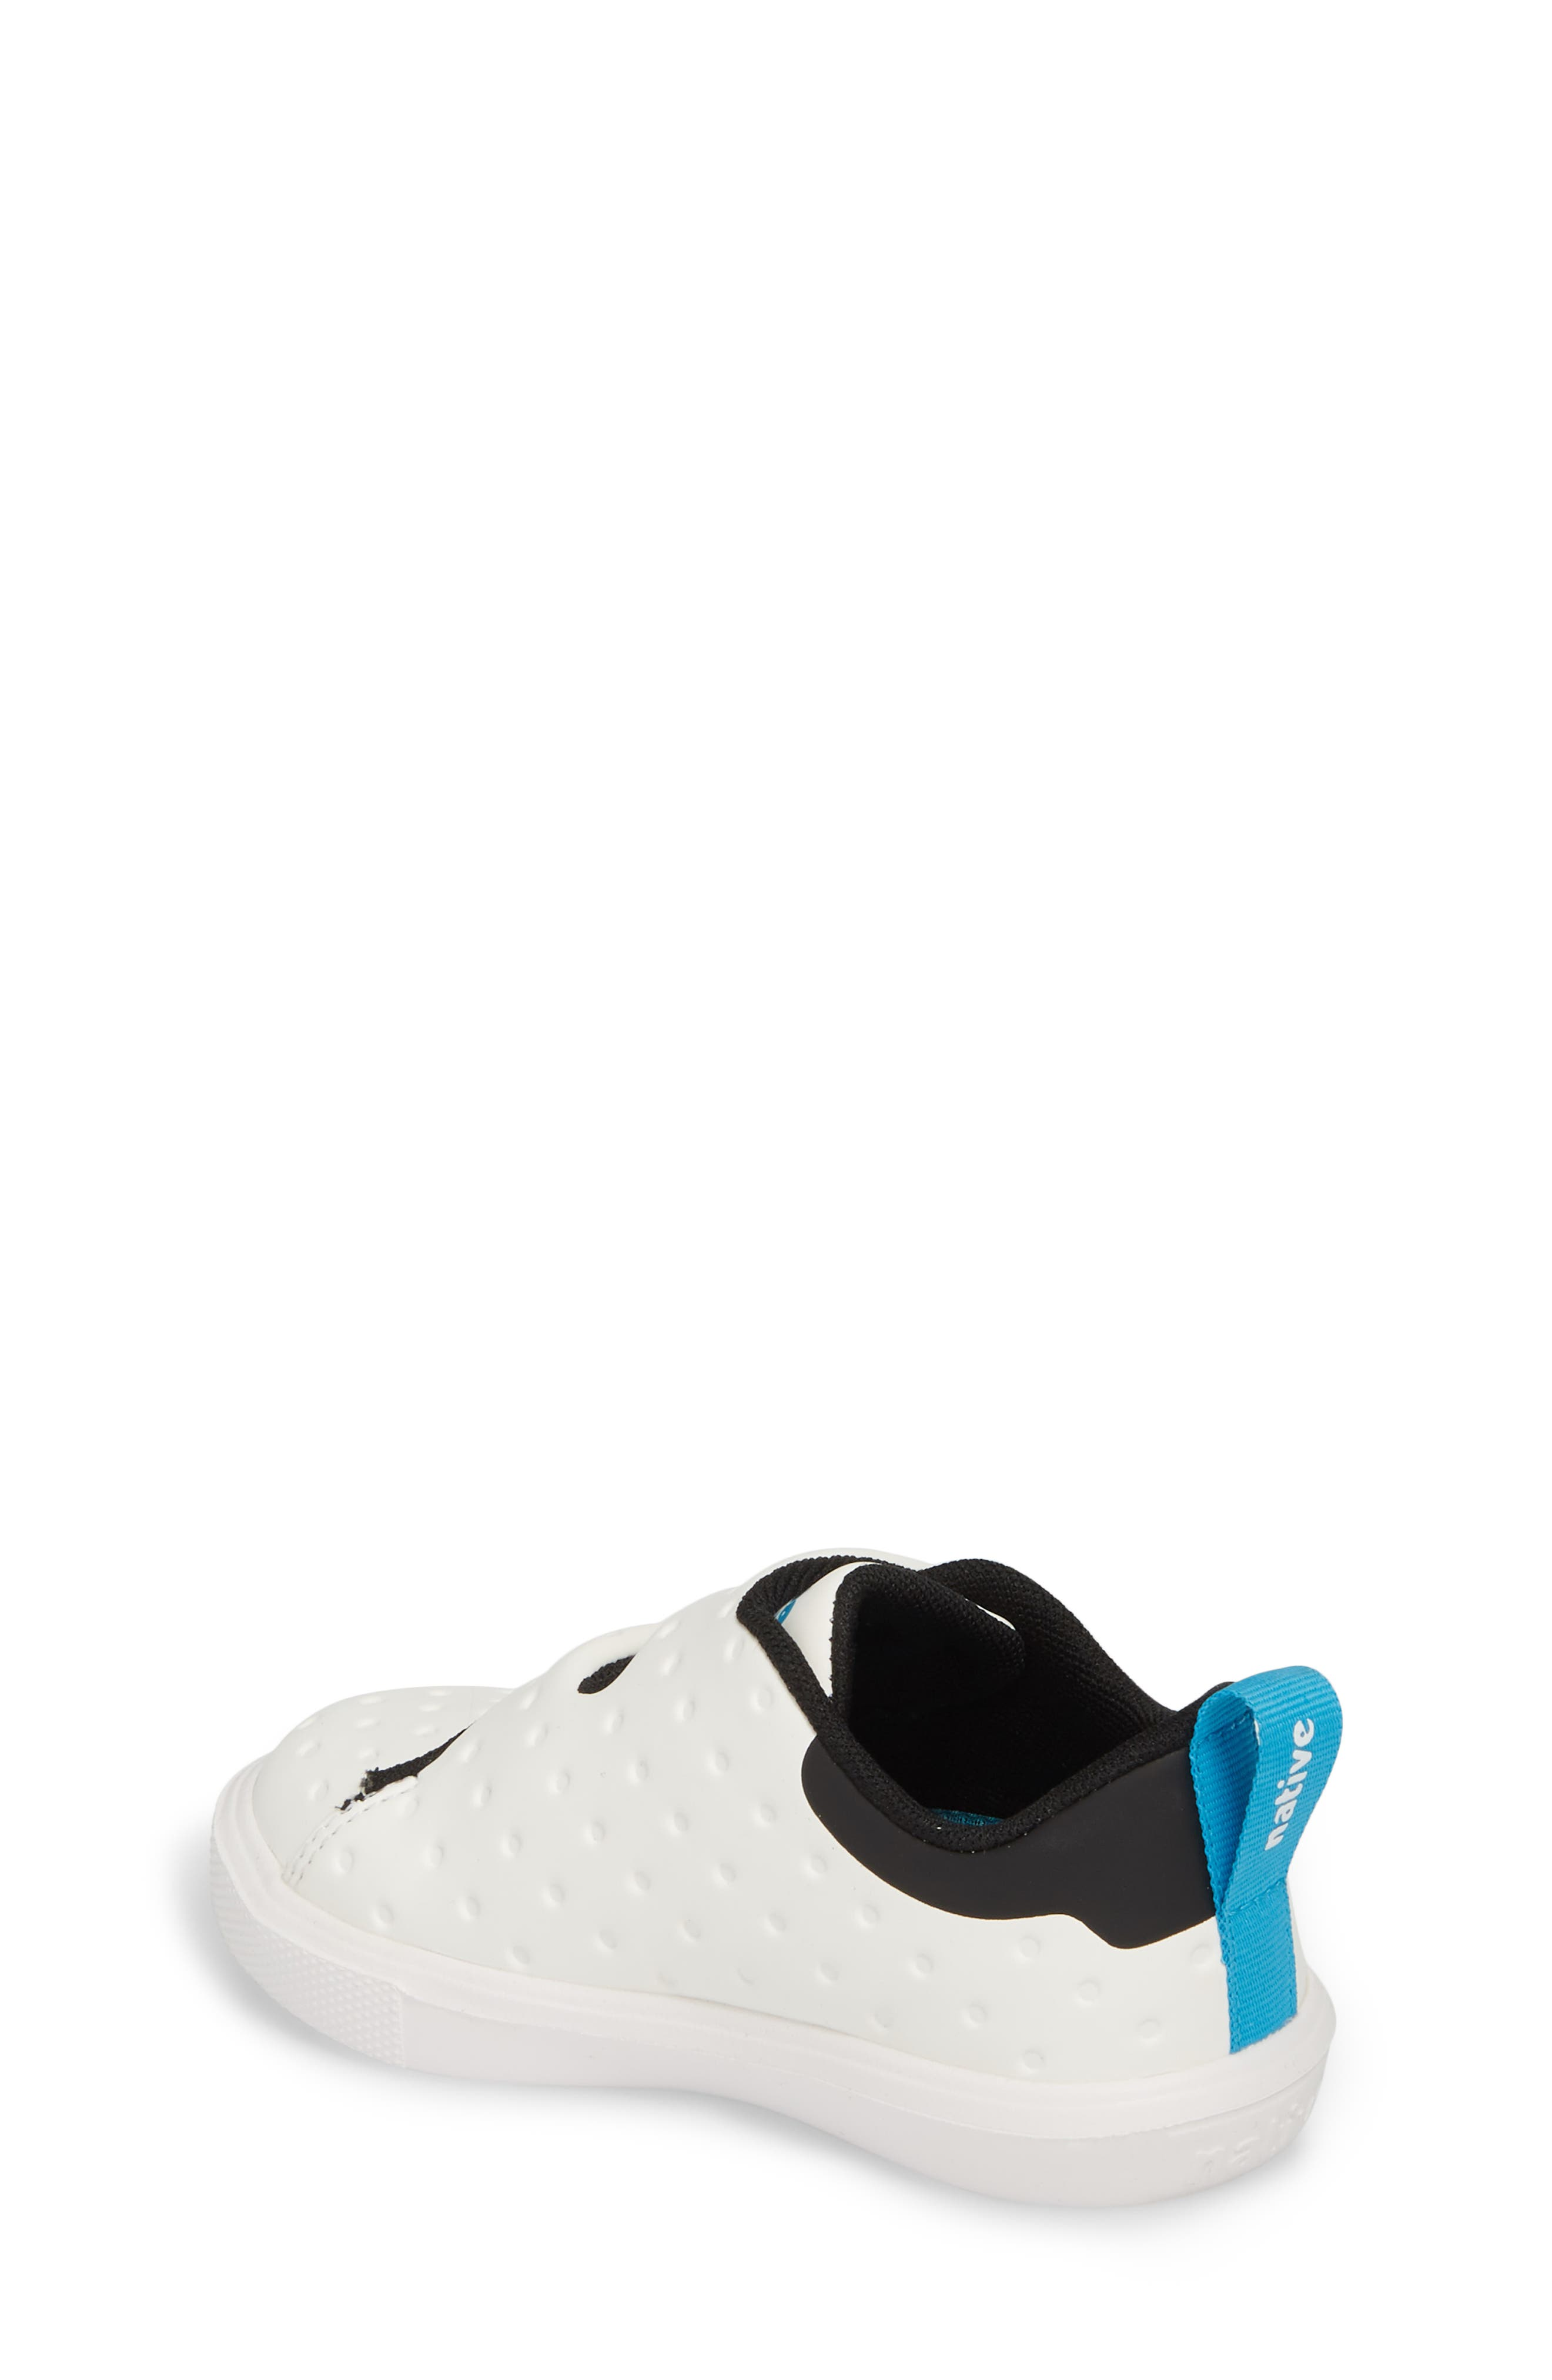 Monaco Sneaker,                             Alternate thumbnail 2, color,                             SHELL WHITE/ JIFFY BLACK